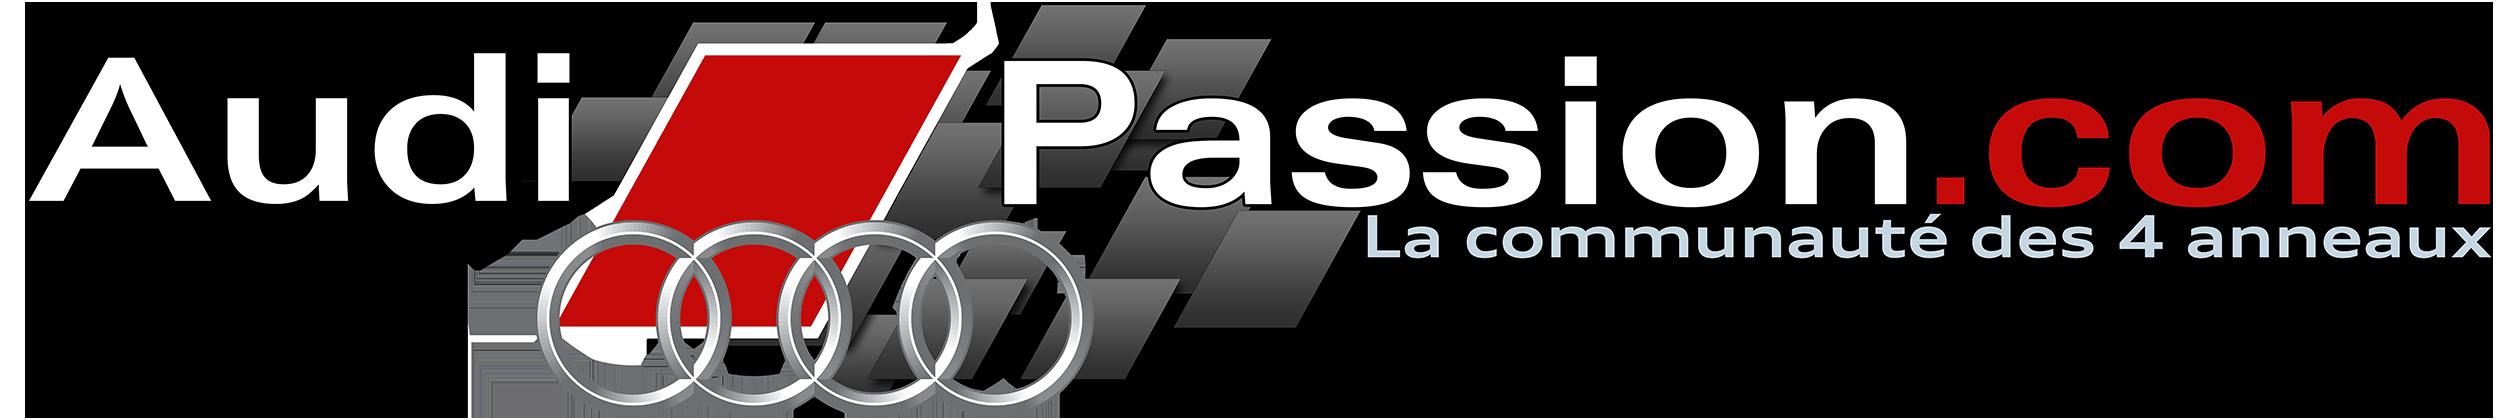 AP_Logo-Stickers_000_2500px_Transparent_v2 copie.png